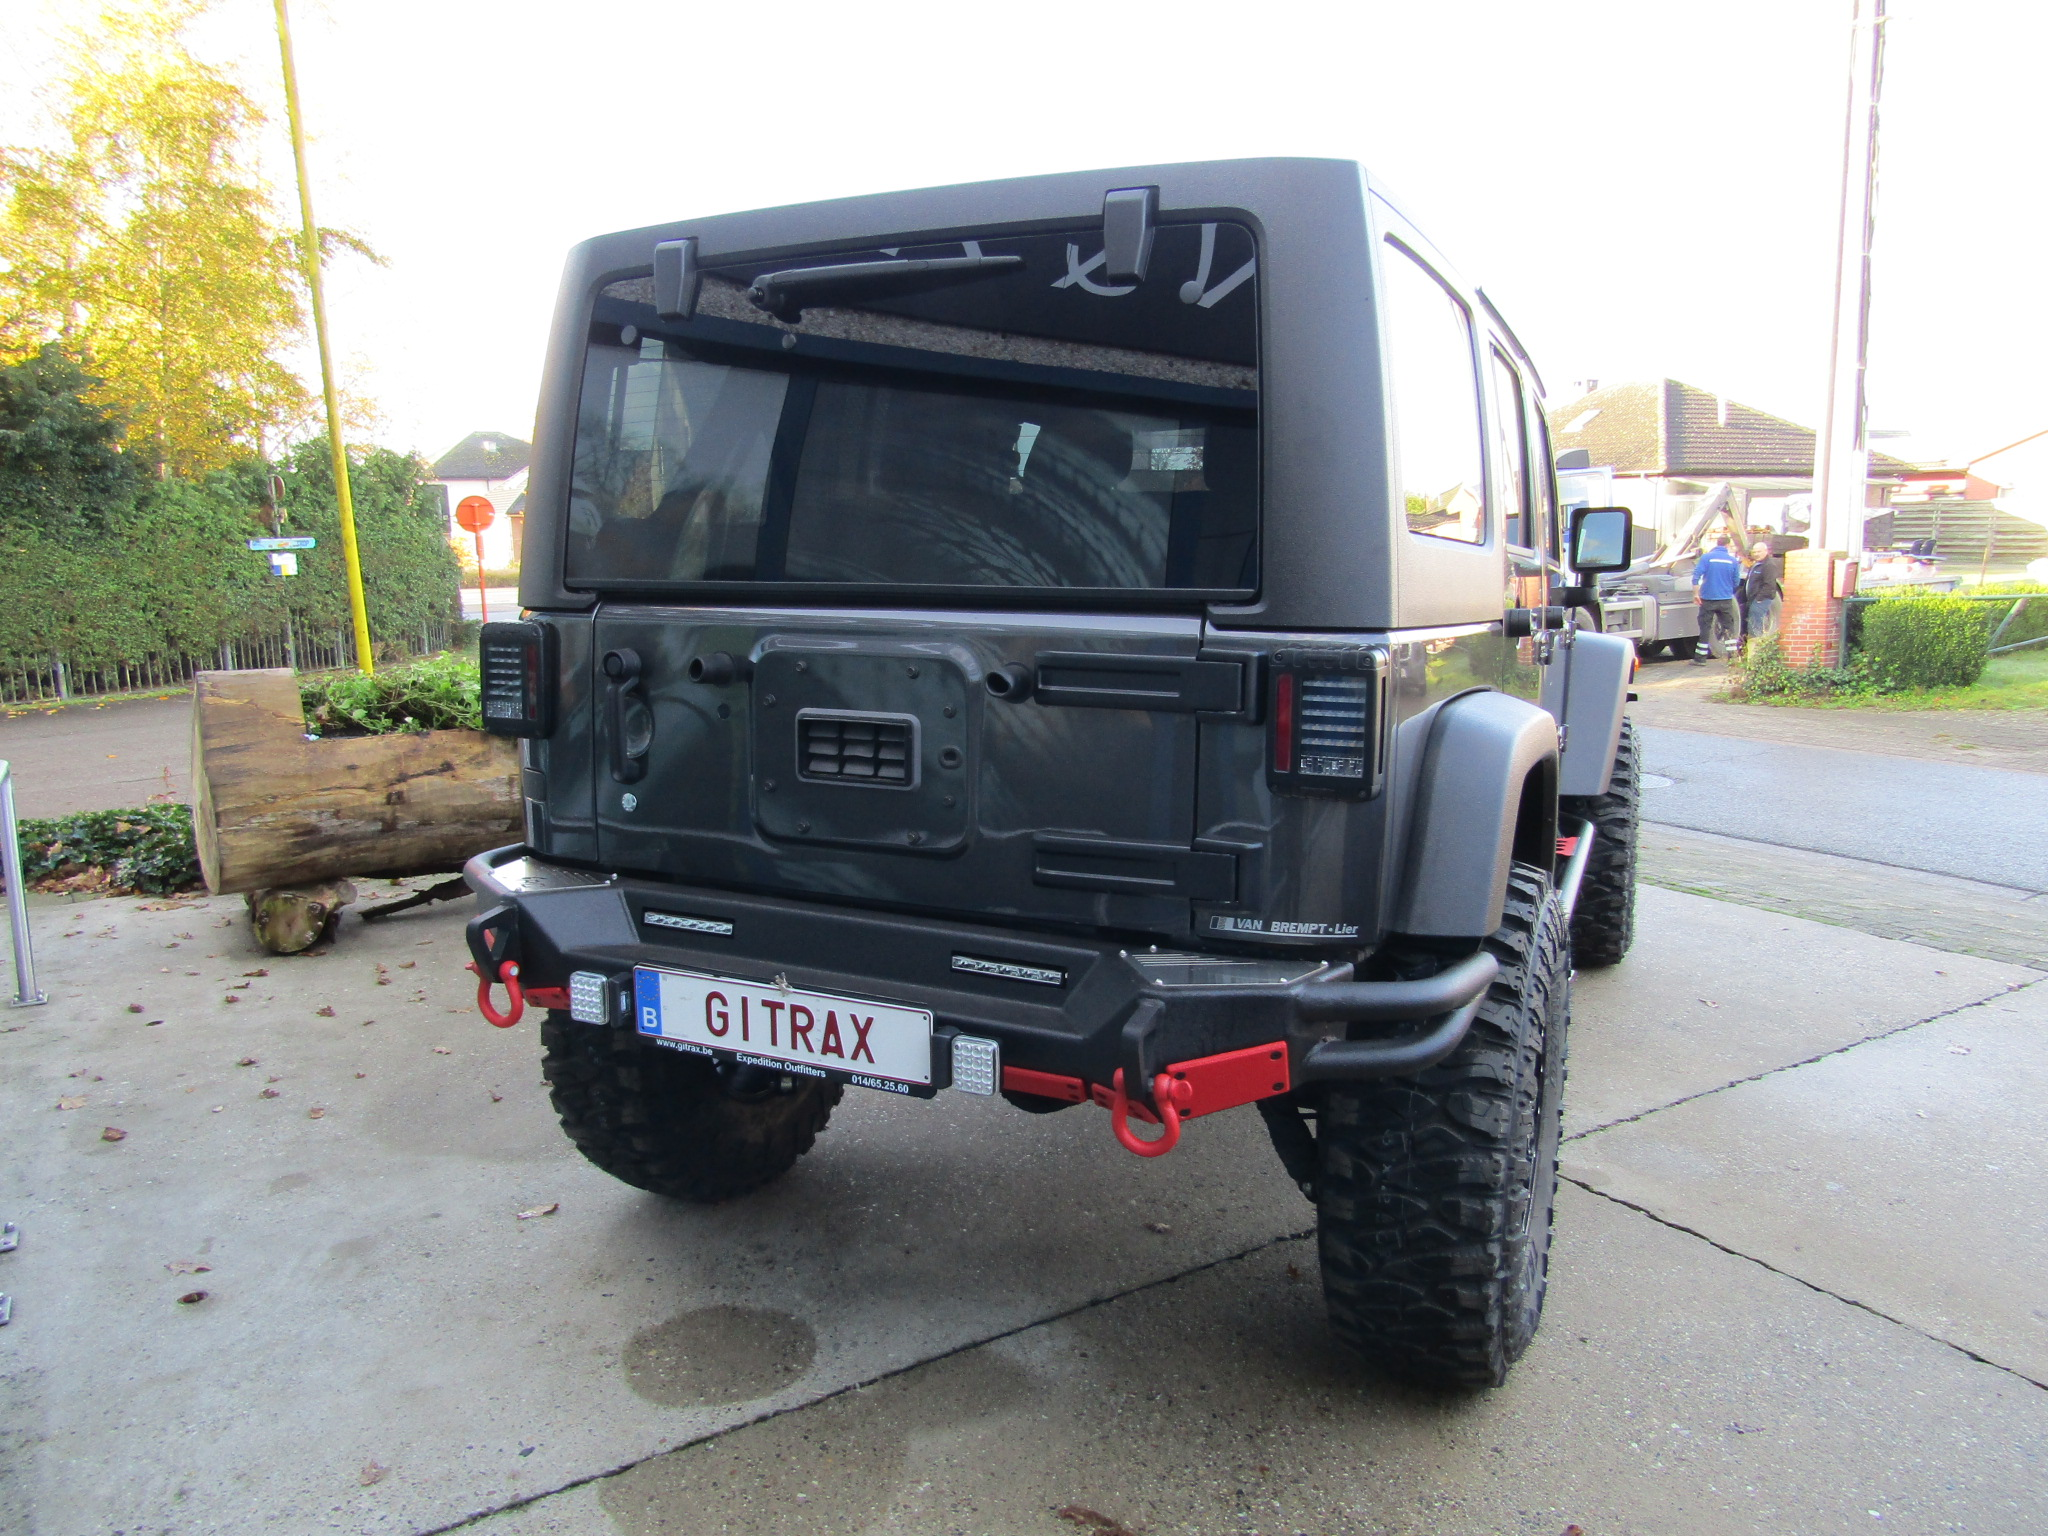 Jeep Gitrax